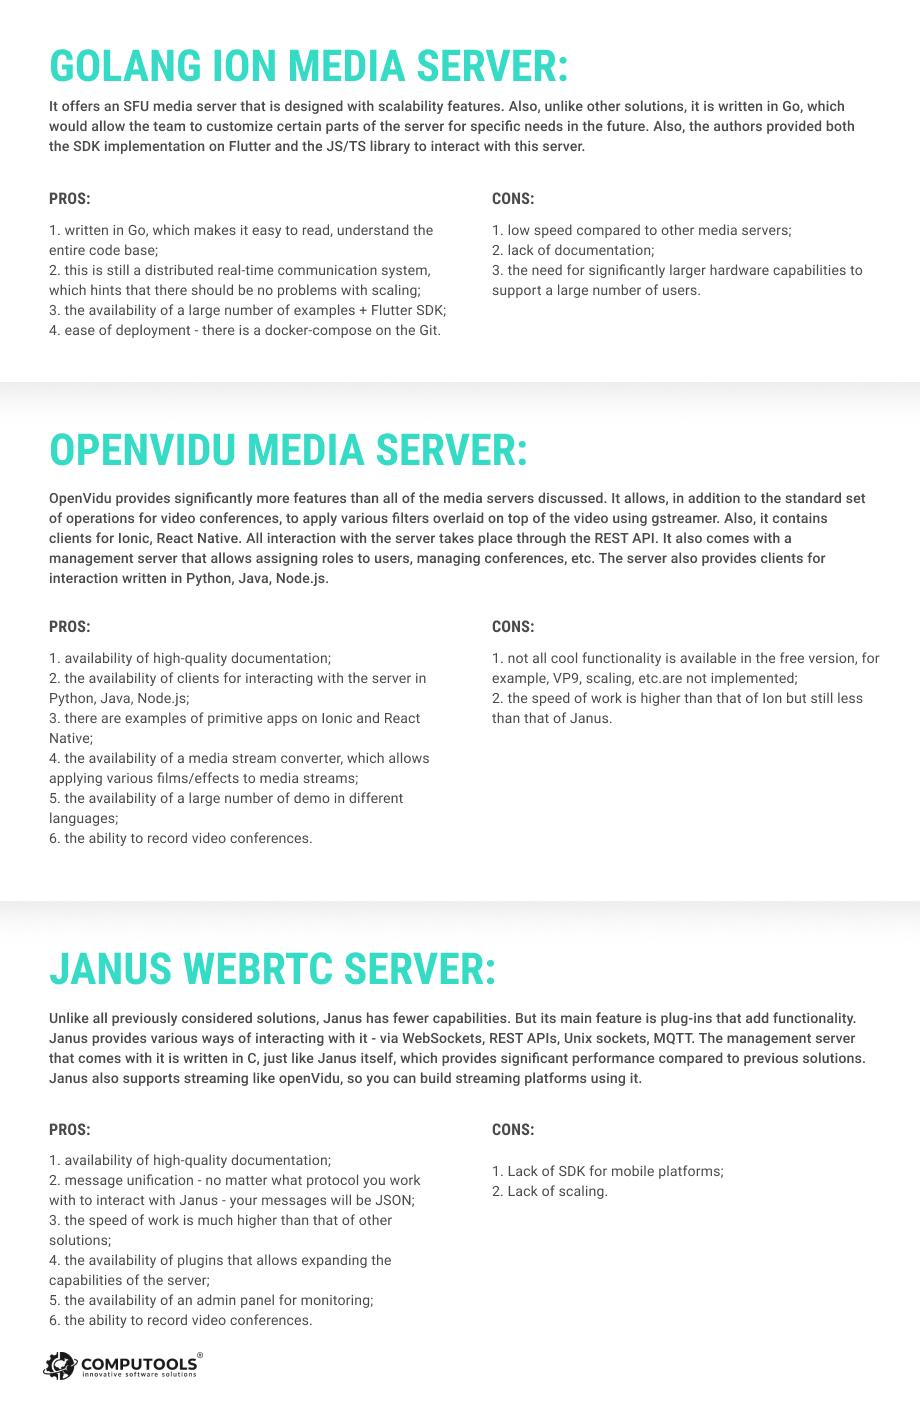 servers comparison image